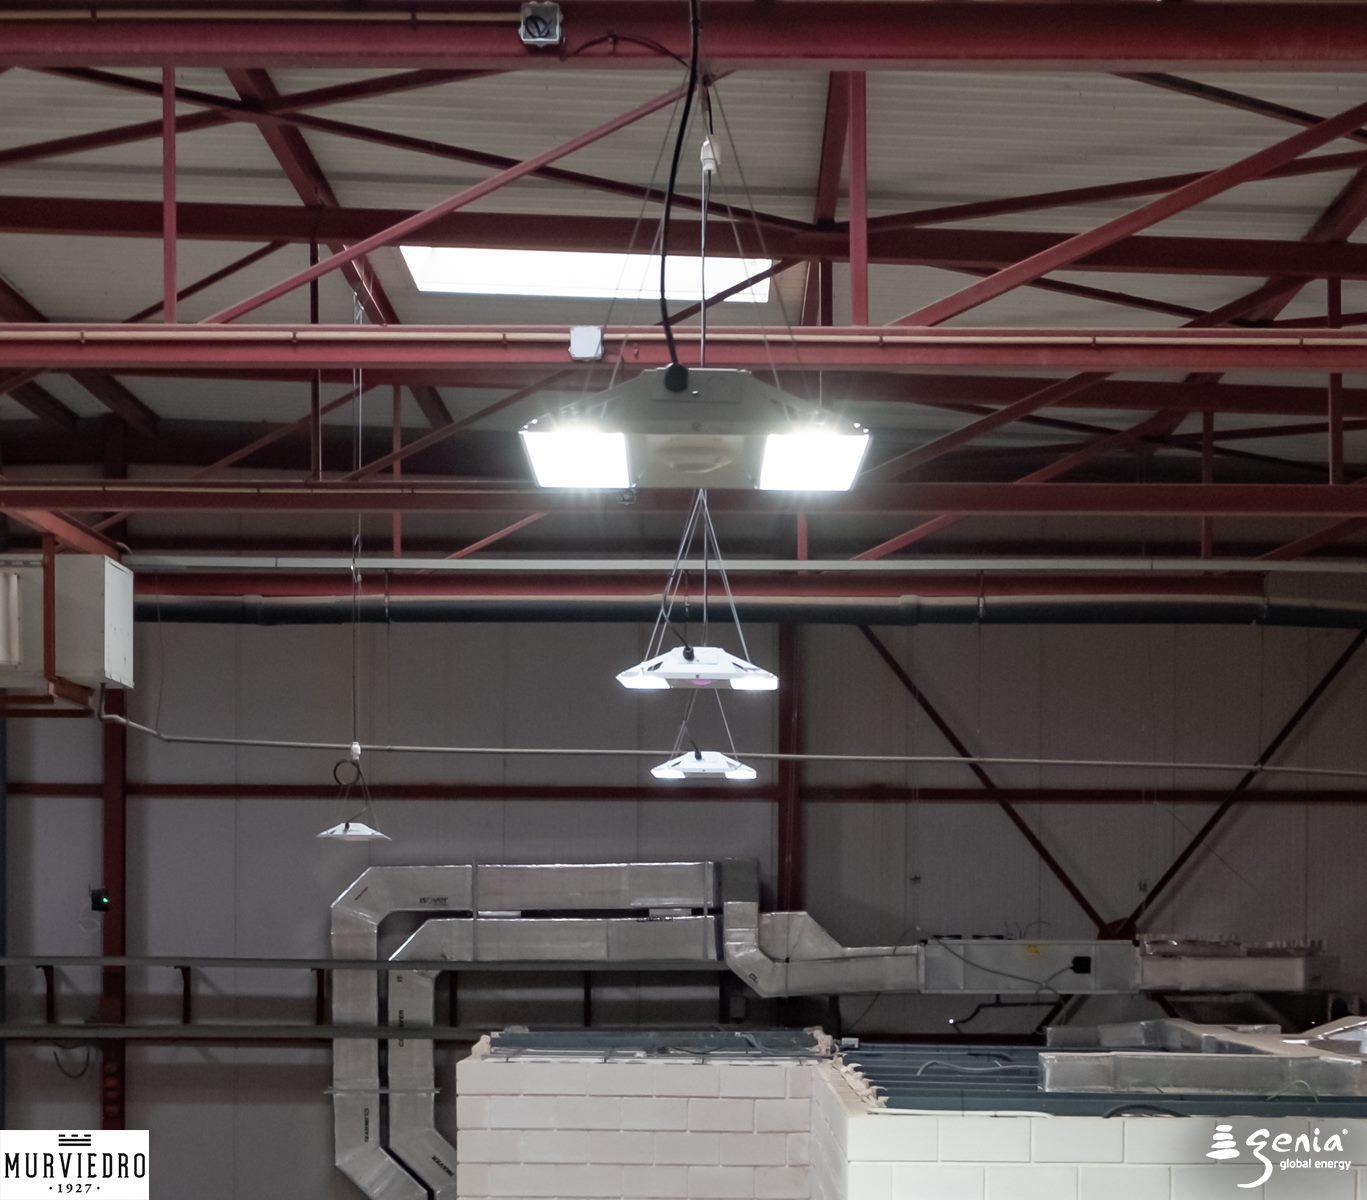 iluminacion-inteligente-industrial-bodegas-murviedro-